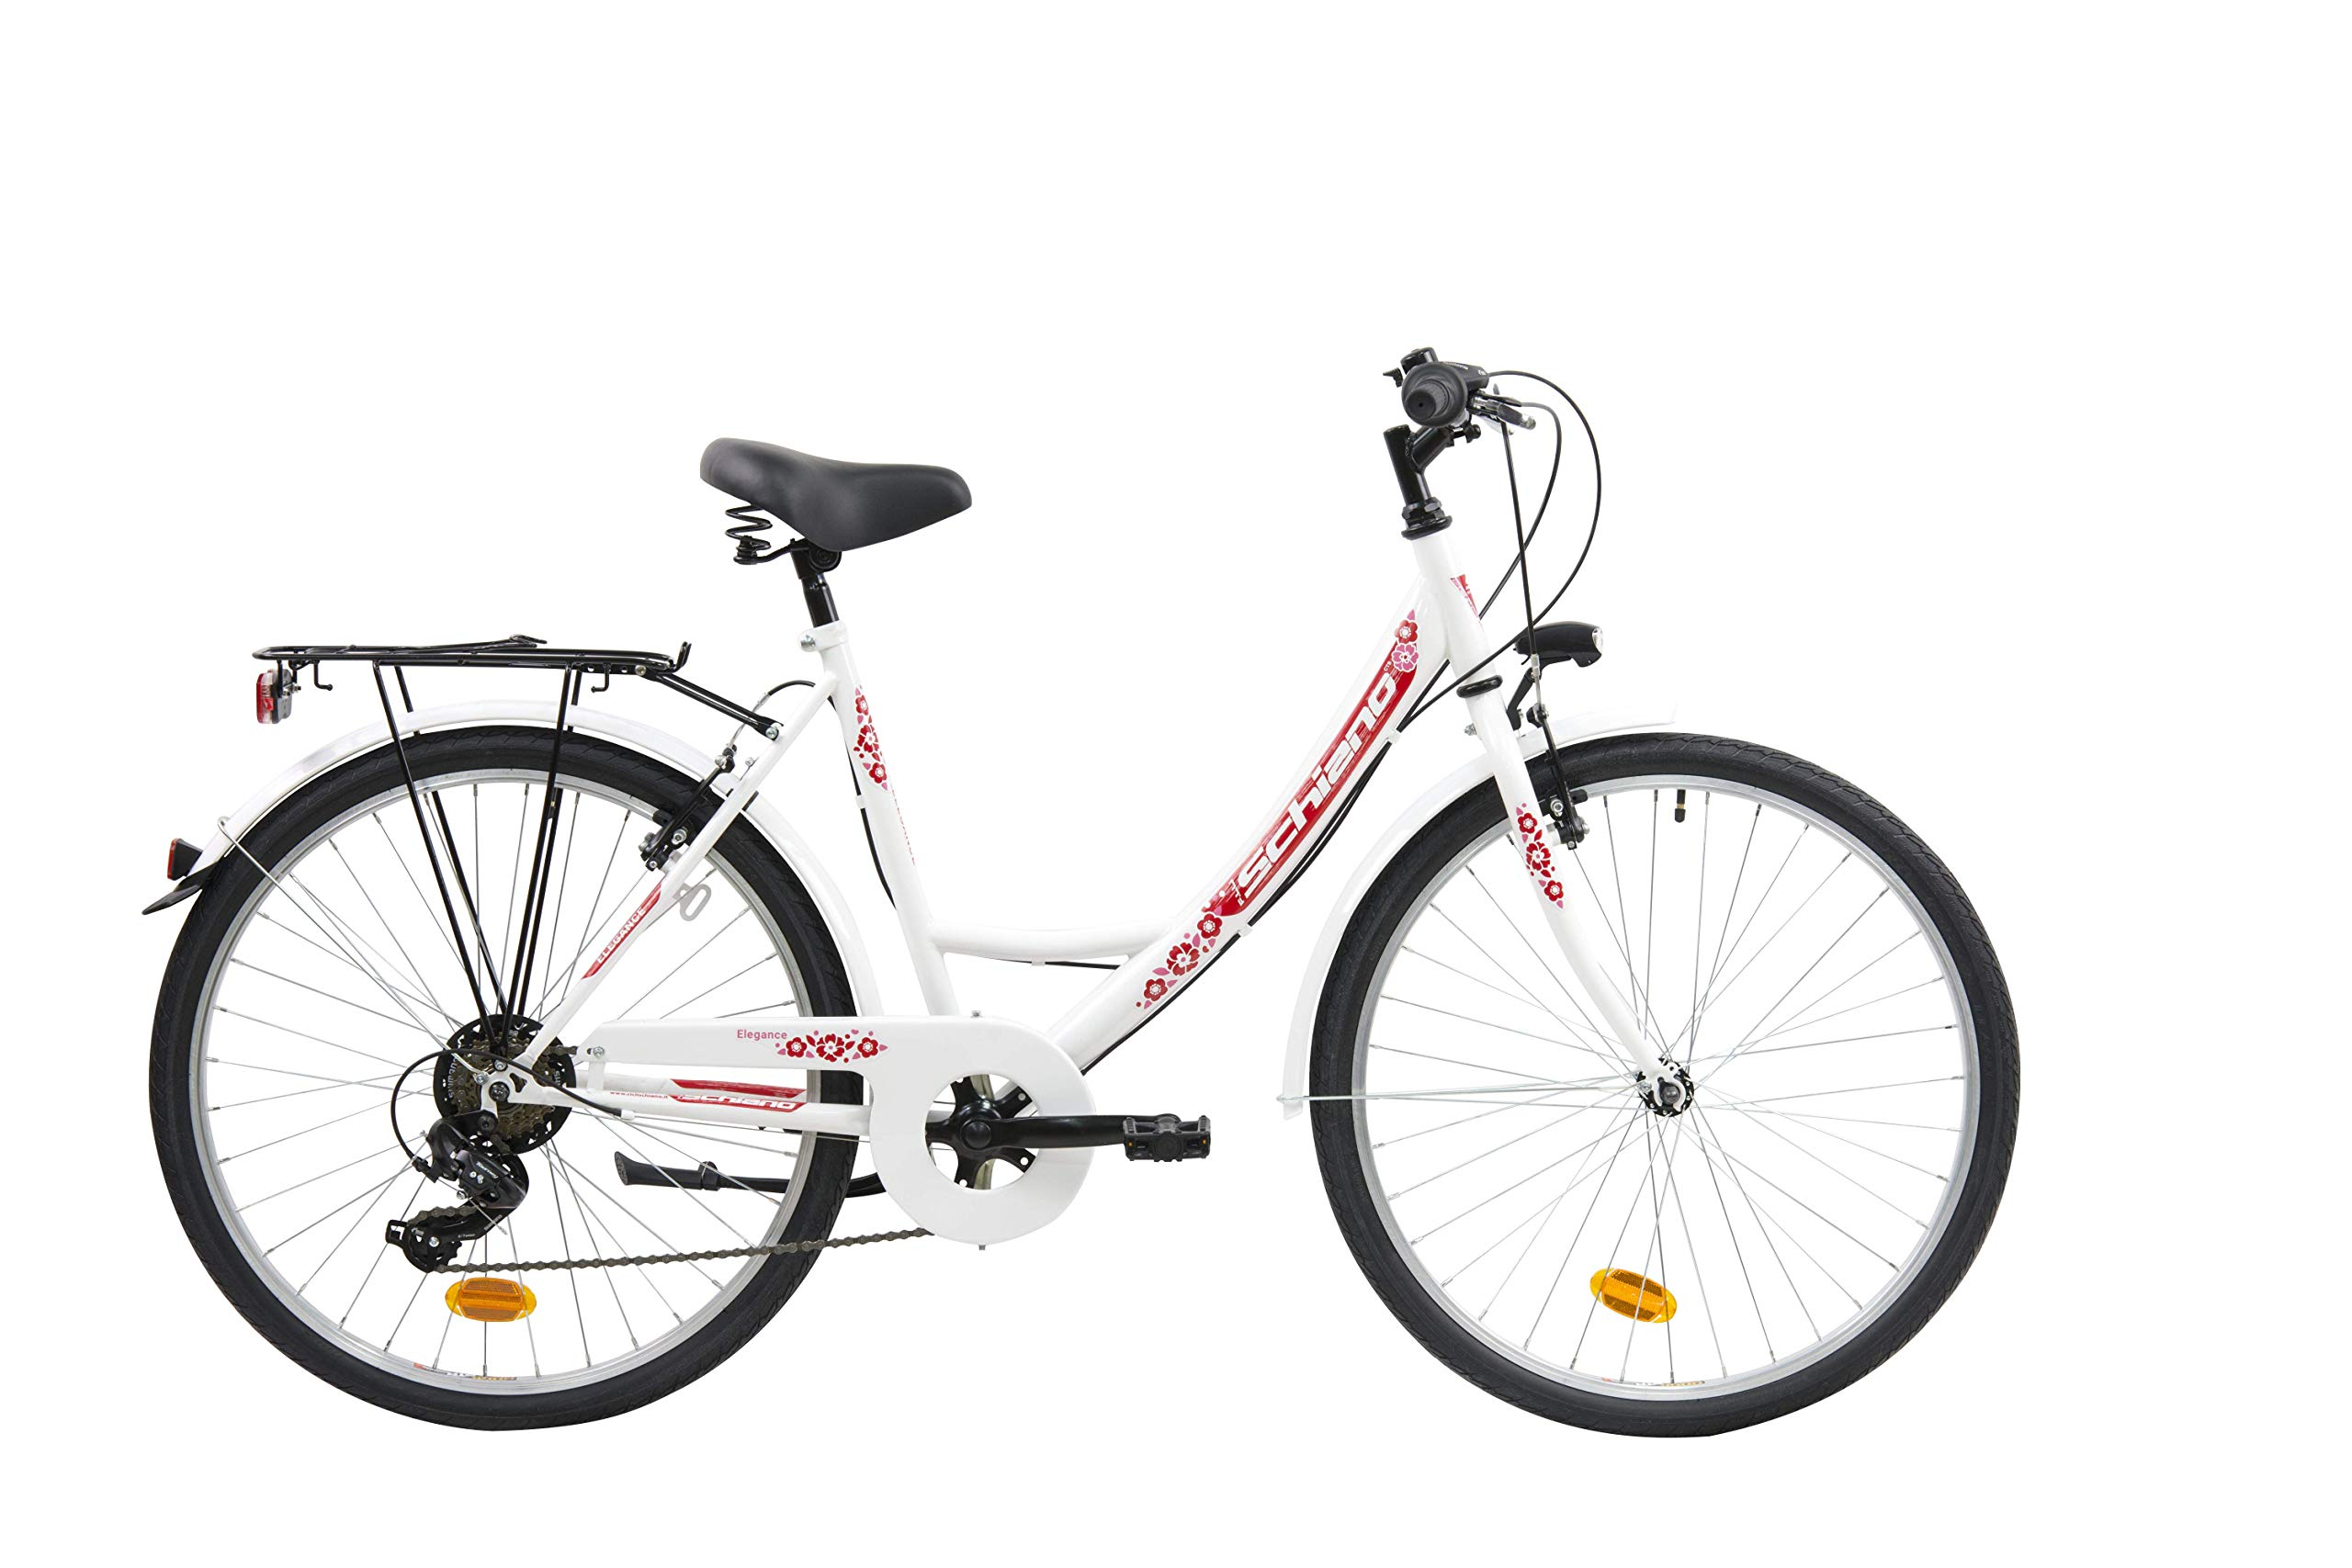 F.lli Schiano Elegance Bicicleta Urbana, Womens, Blanco-Rojo, 26 ...